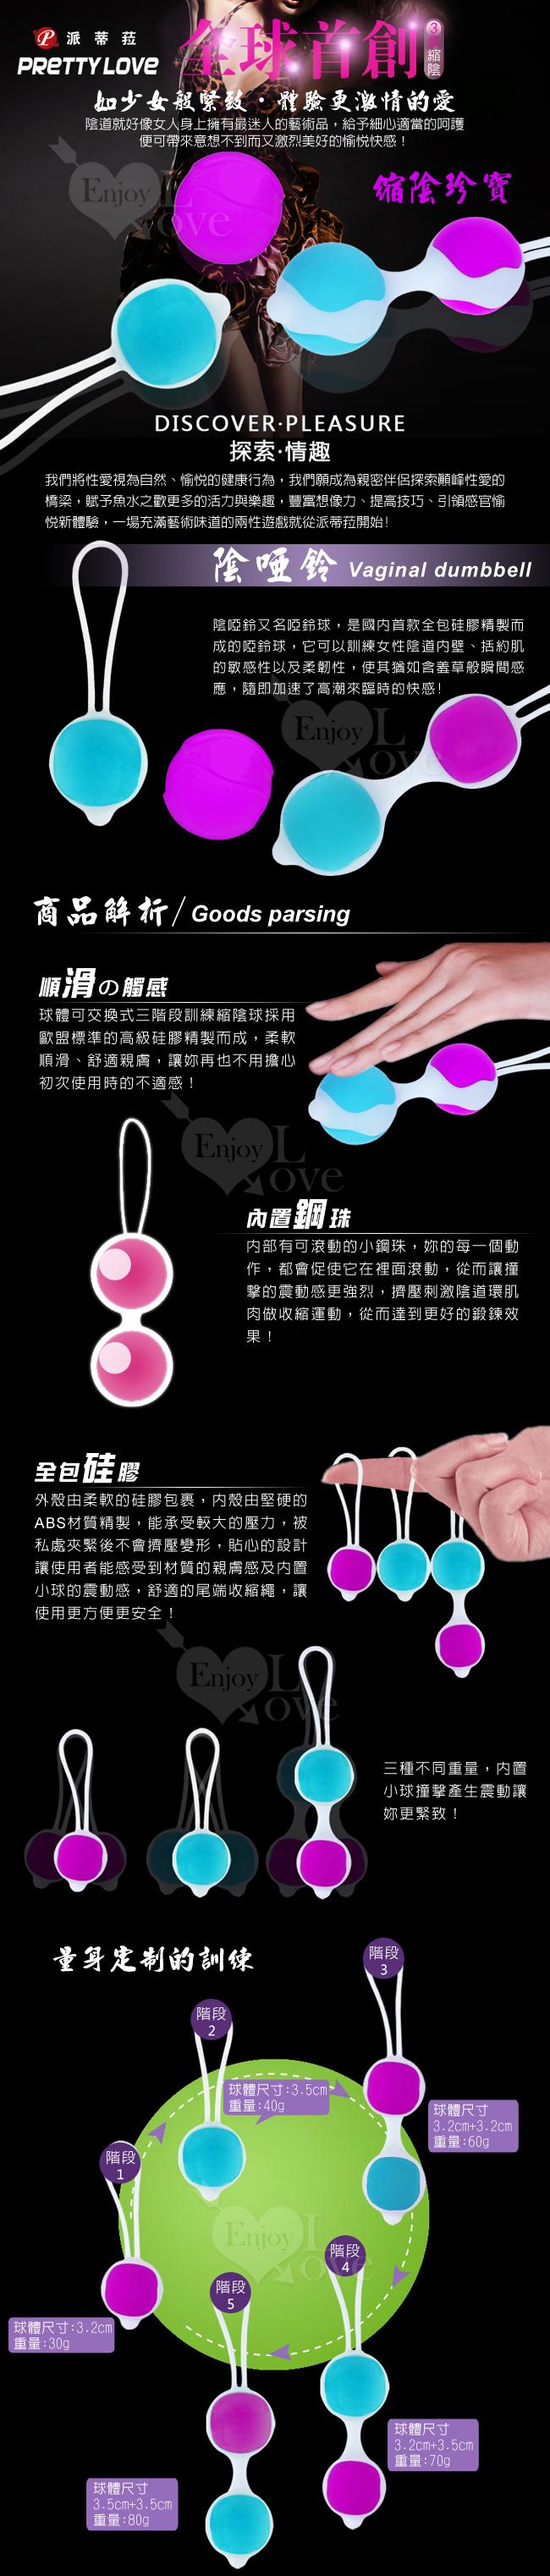 PRETTY LOVE 派蒂菈‧Drgasmic Ball 縮陰珍寶 球體可交換式三階段訓練禮盒